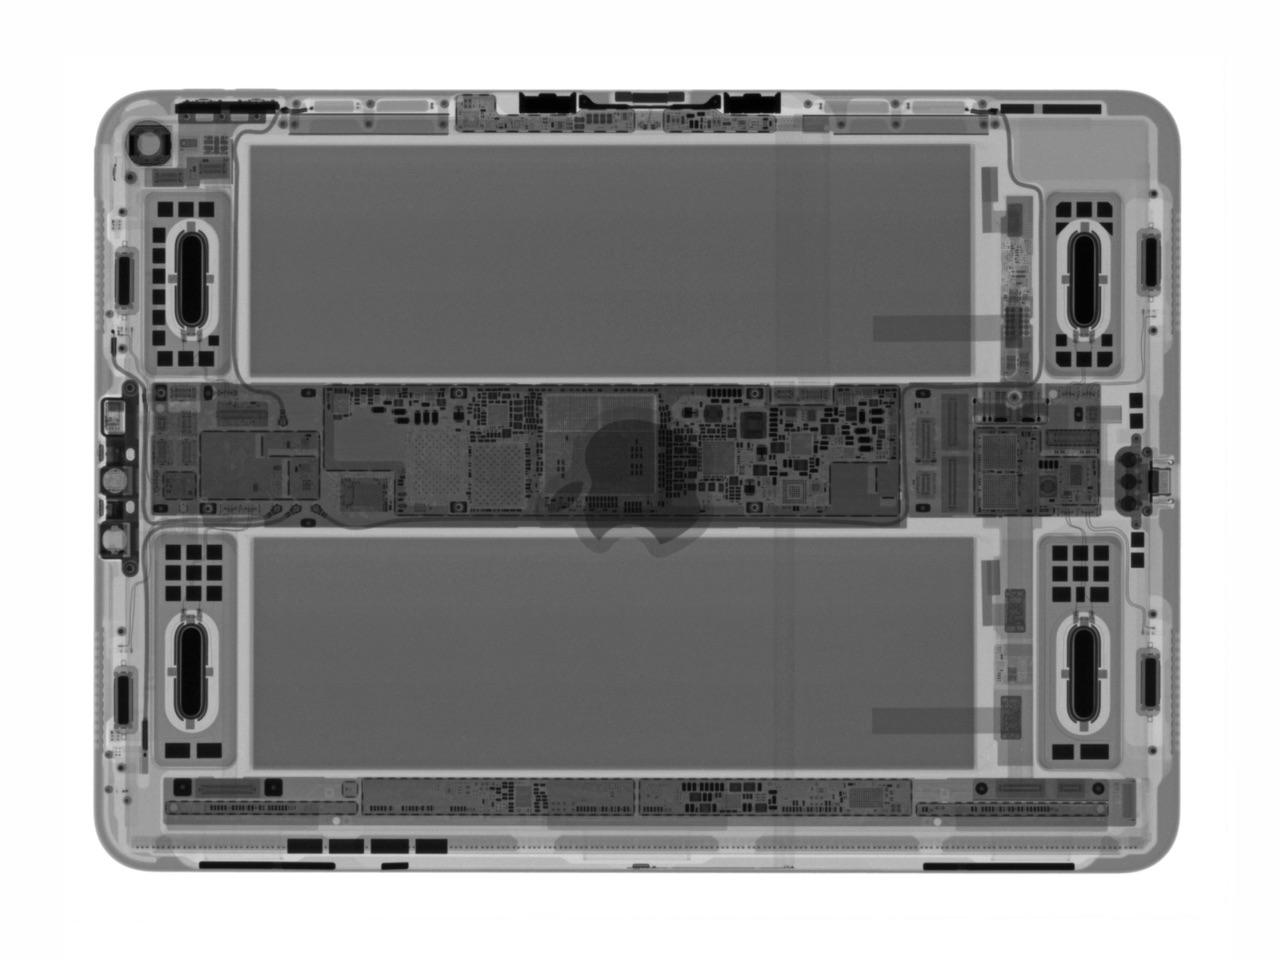 iPad Pro 2018 teardown van iFixit met röntgen.